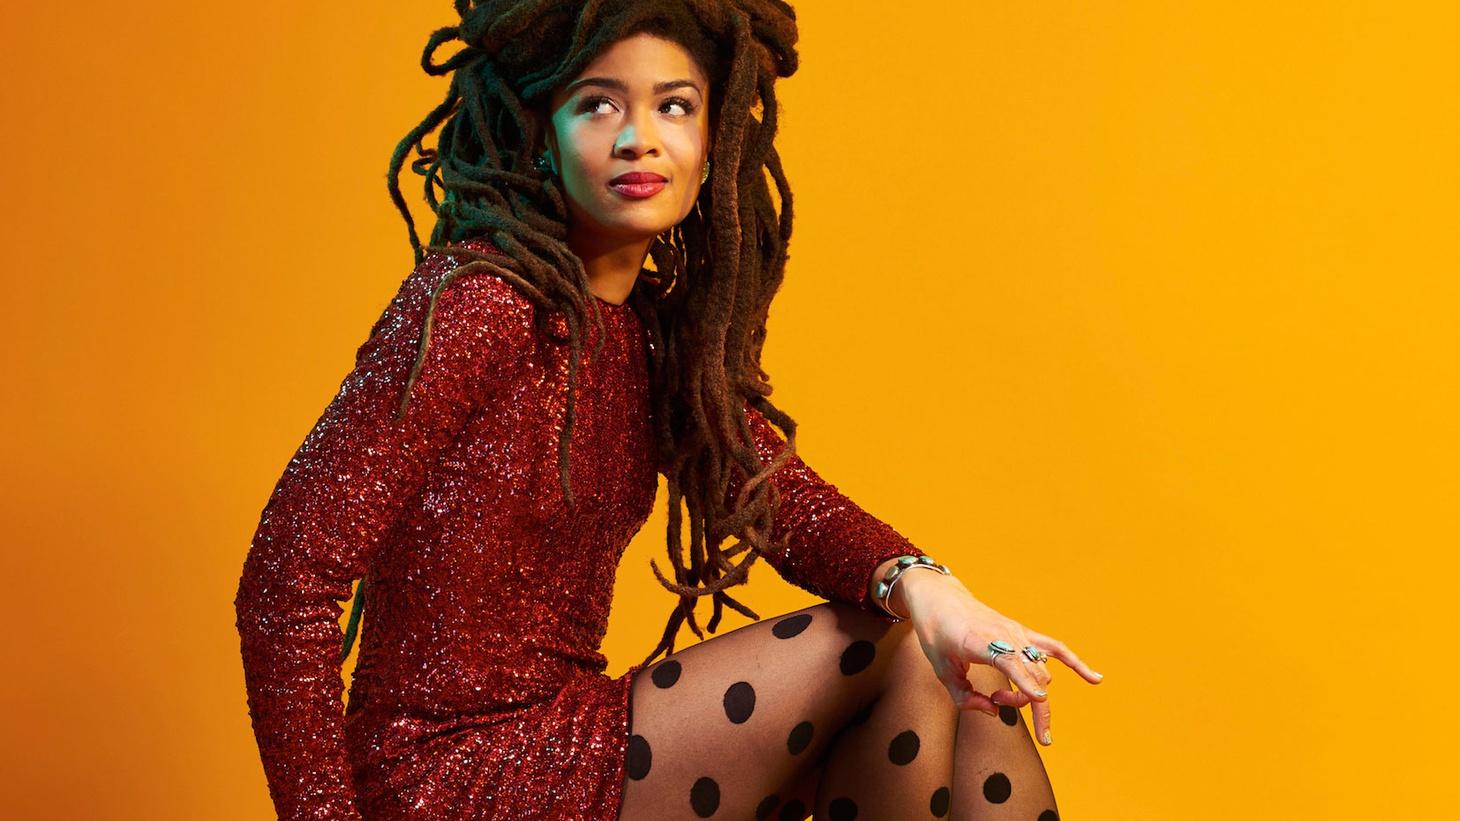 Memphis-born singer Valerie June has garnered well-deserved critical acclaim.